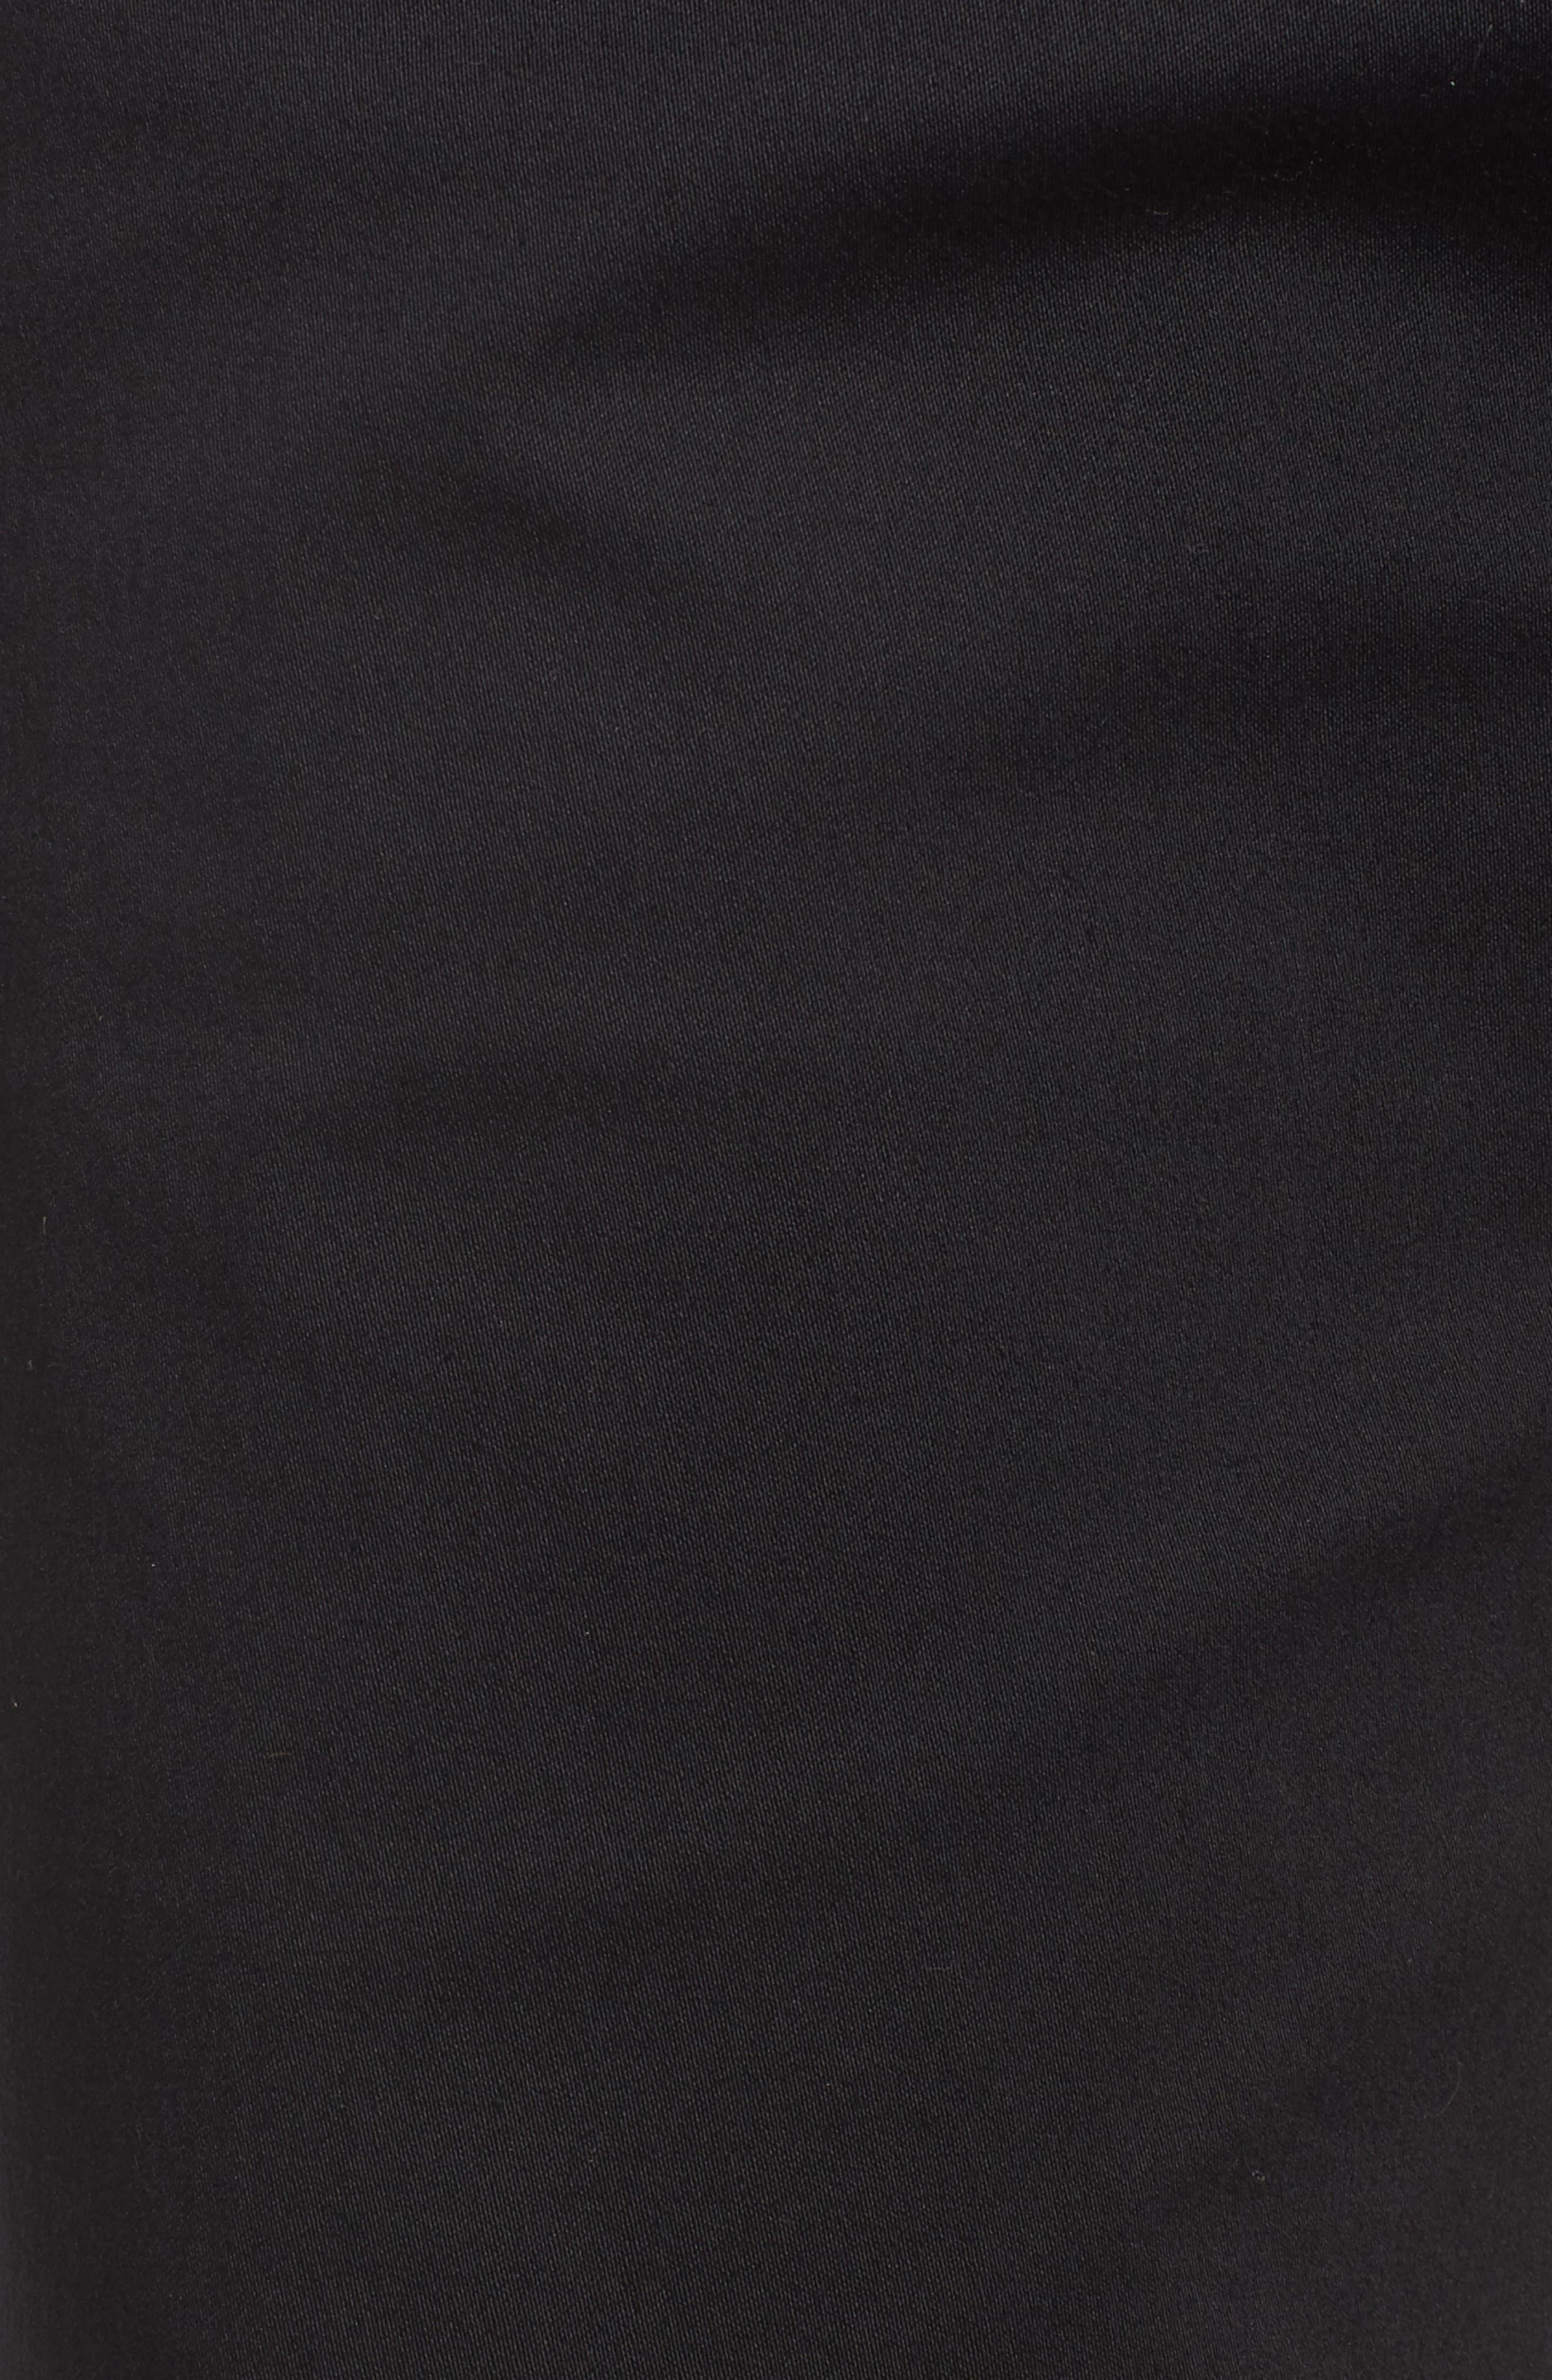 Stretch Cotton Cuff Bermuda Shorts,                             Alternate thumbnail 5, color,                             Perma Black